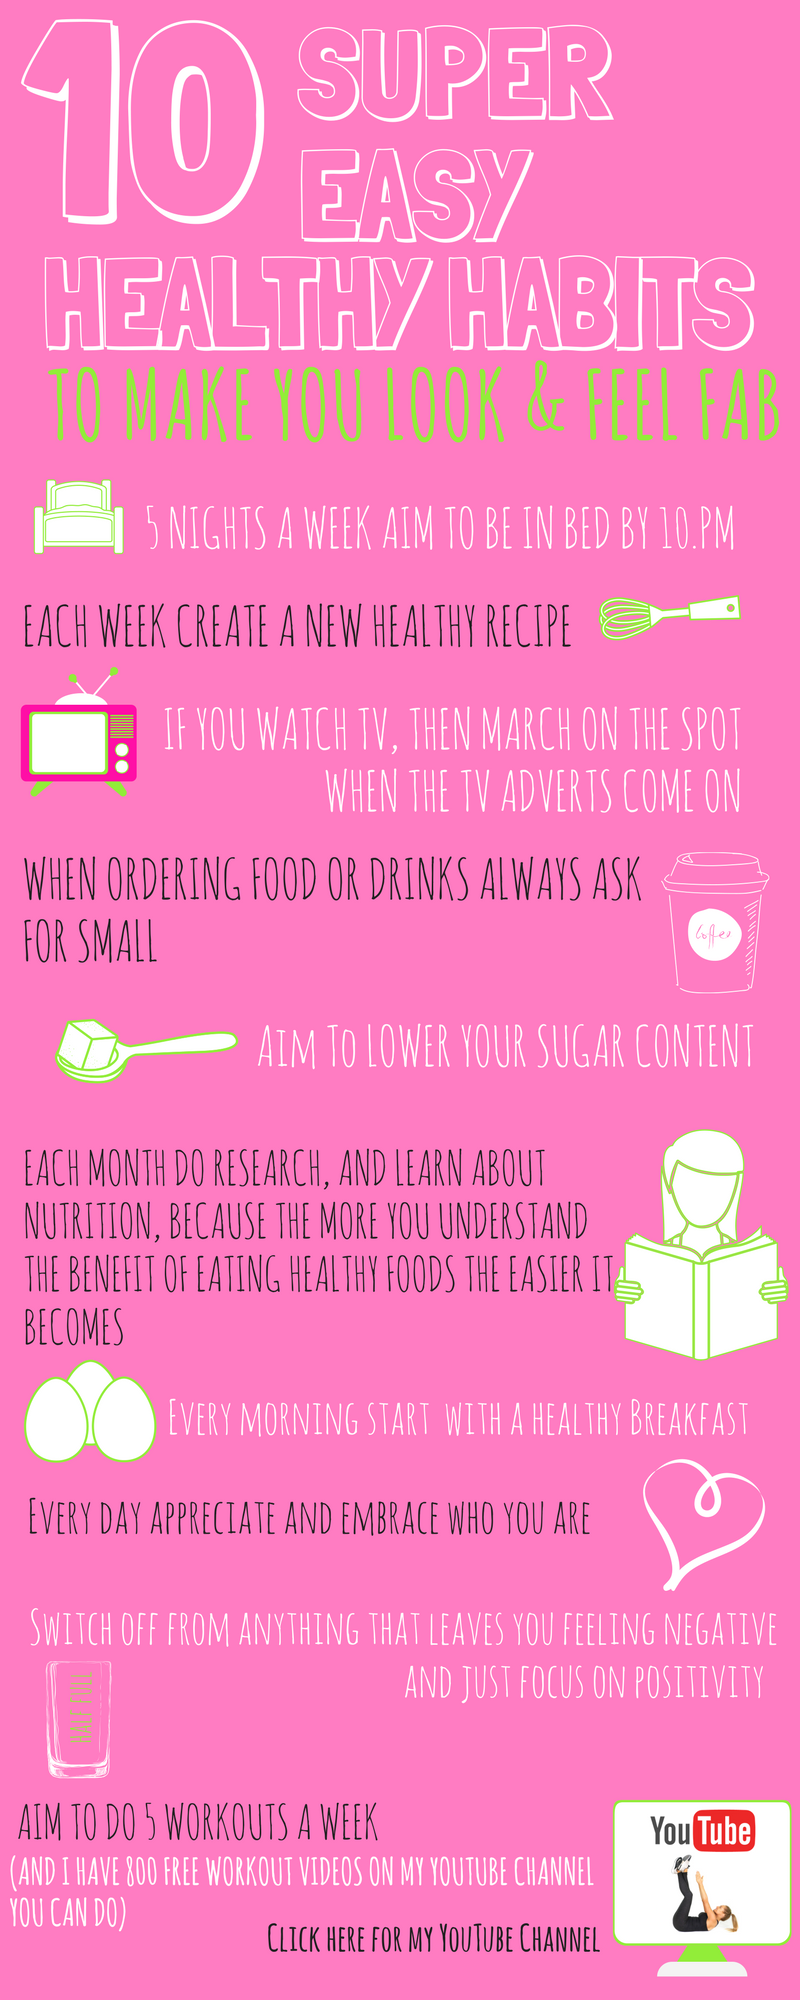 10 slimme foods alumine kehakaalu langetamise nouanded